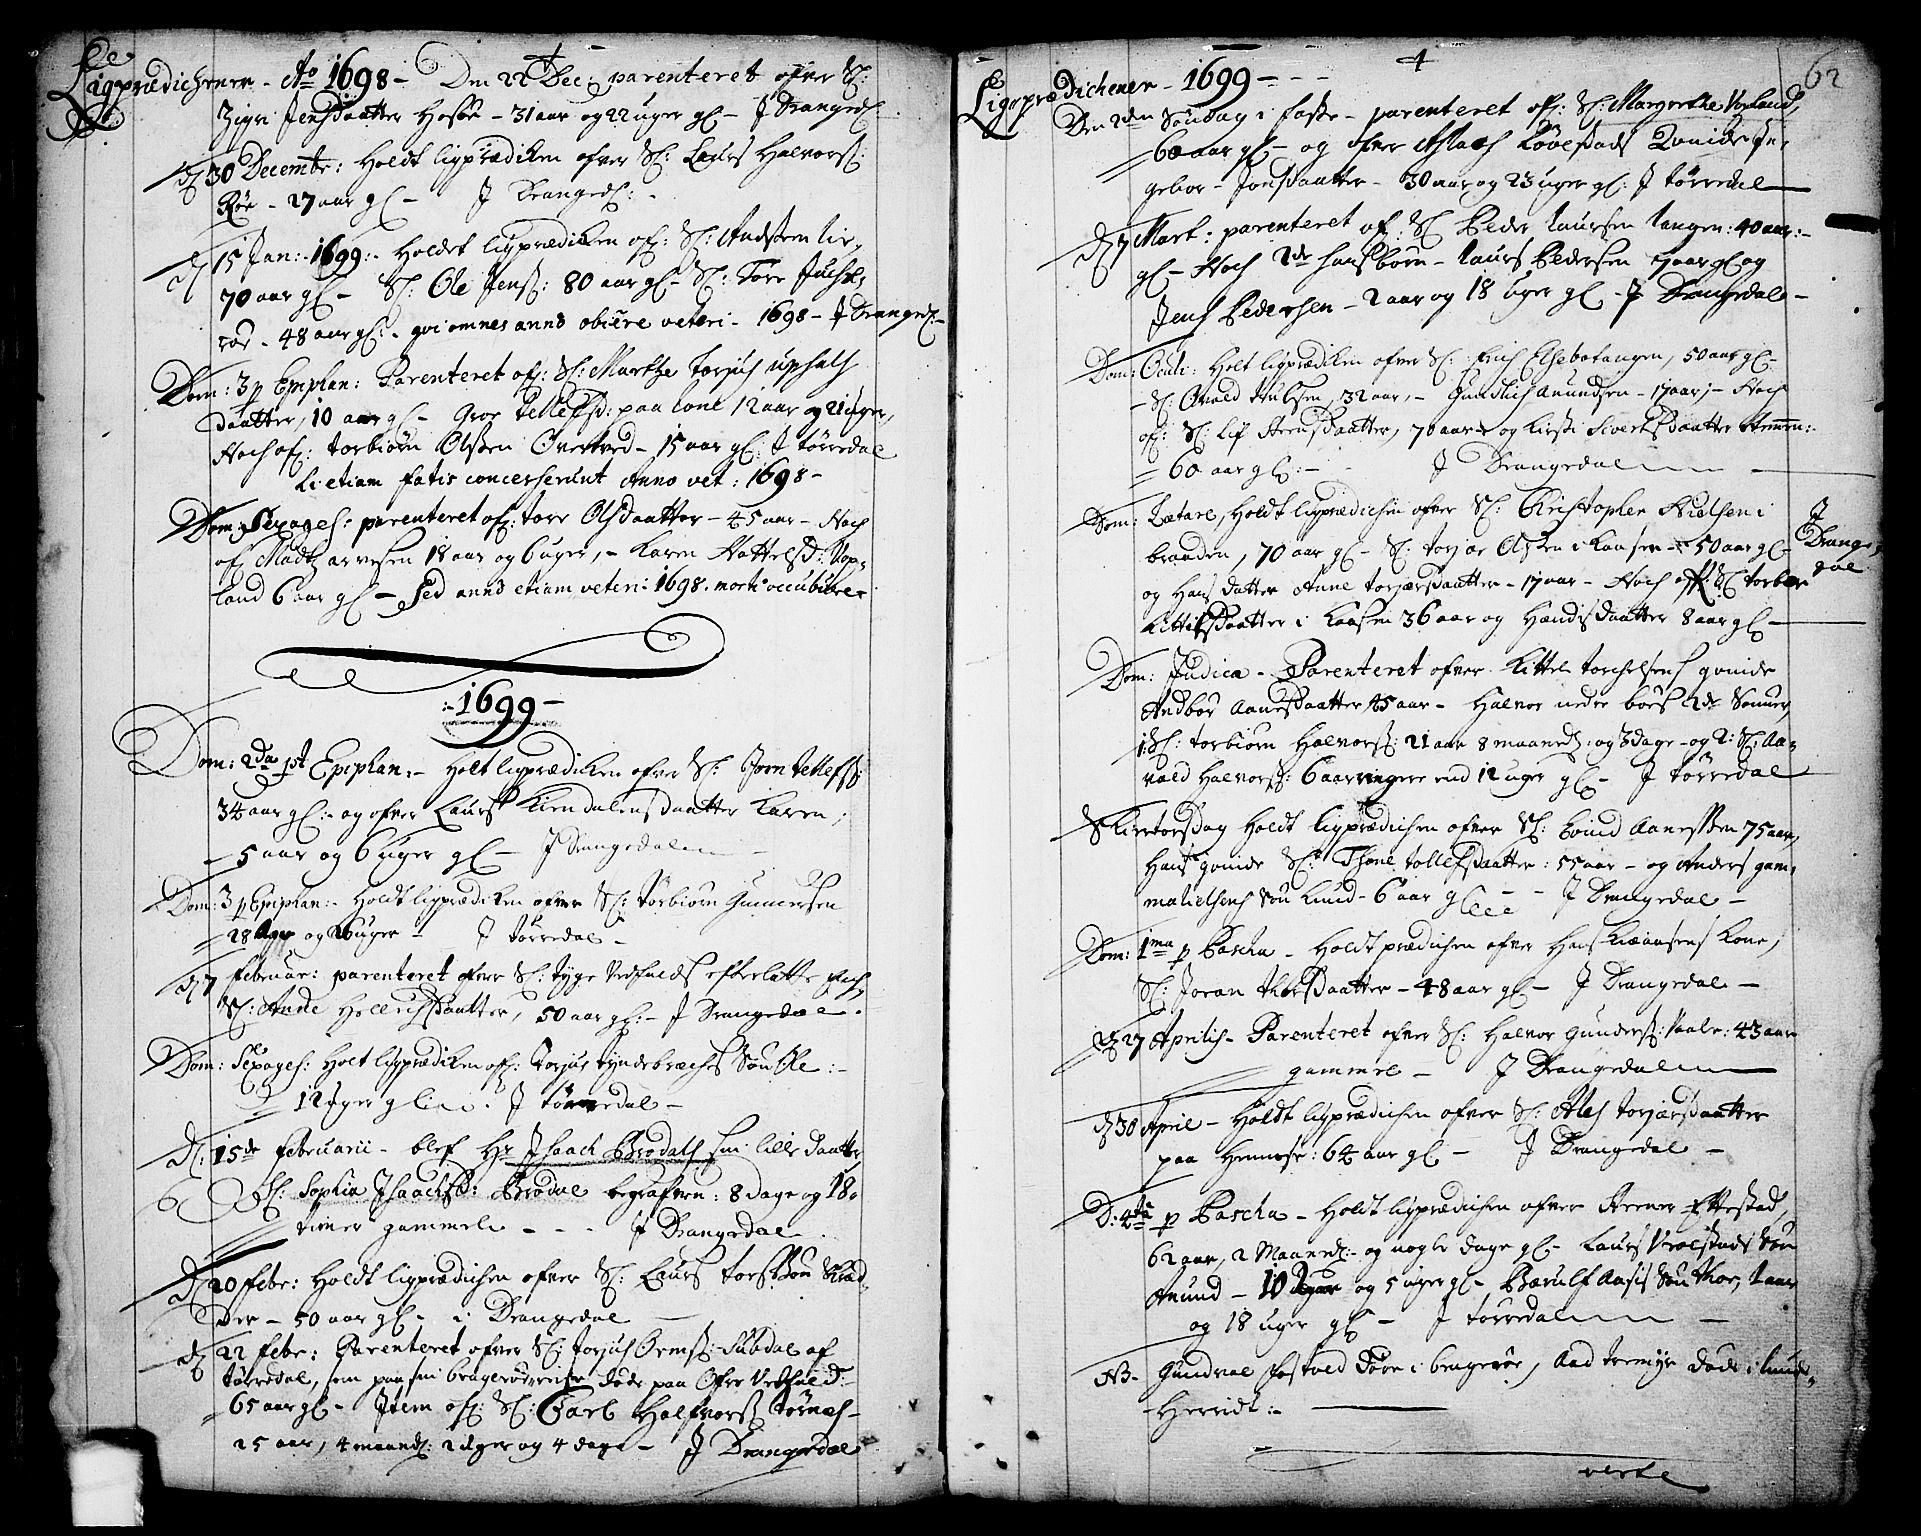 SAKO, Drangedal kirkebøker, F/Fa/L0001: Ministerialbok nr. 1, 1697-1767, s. 62